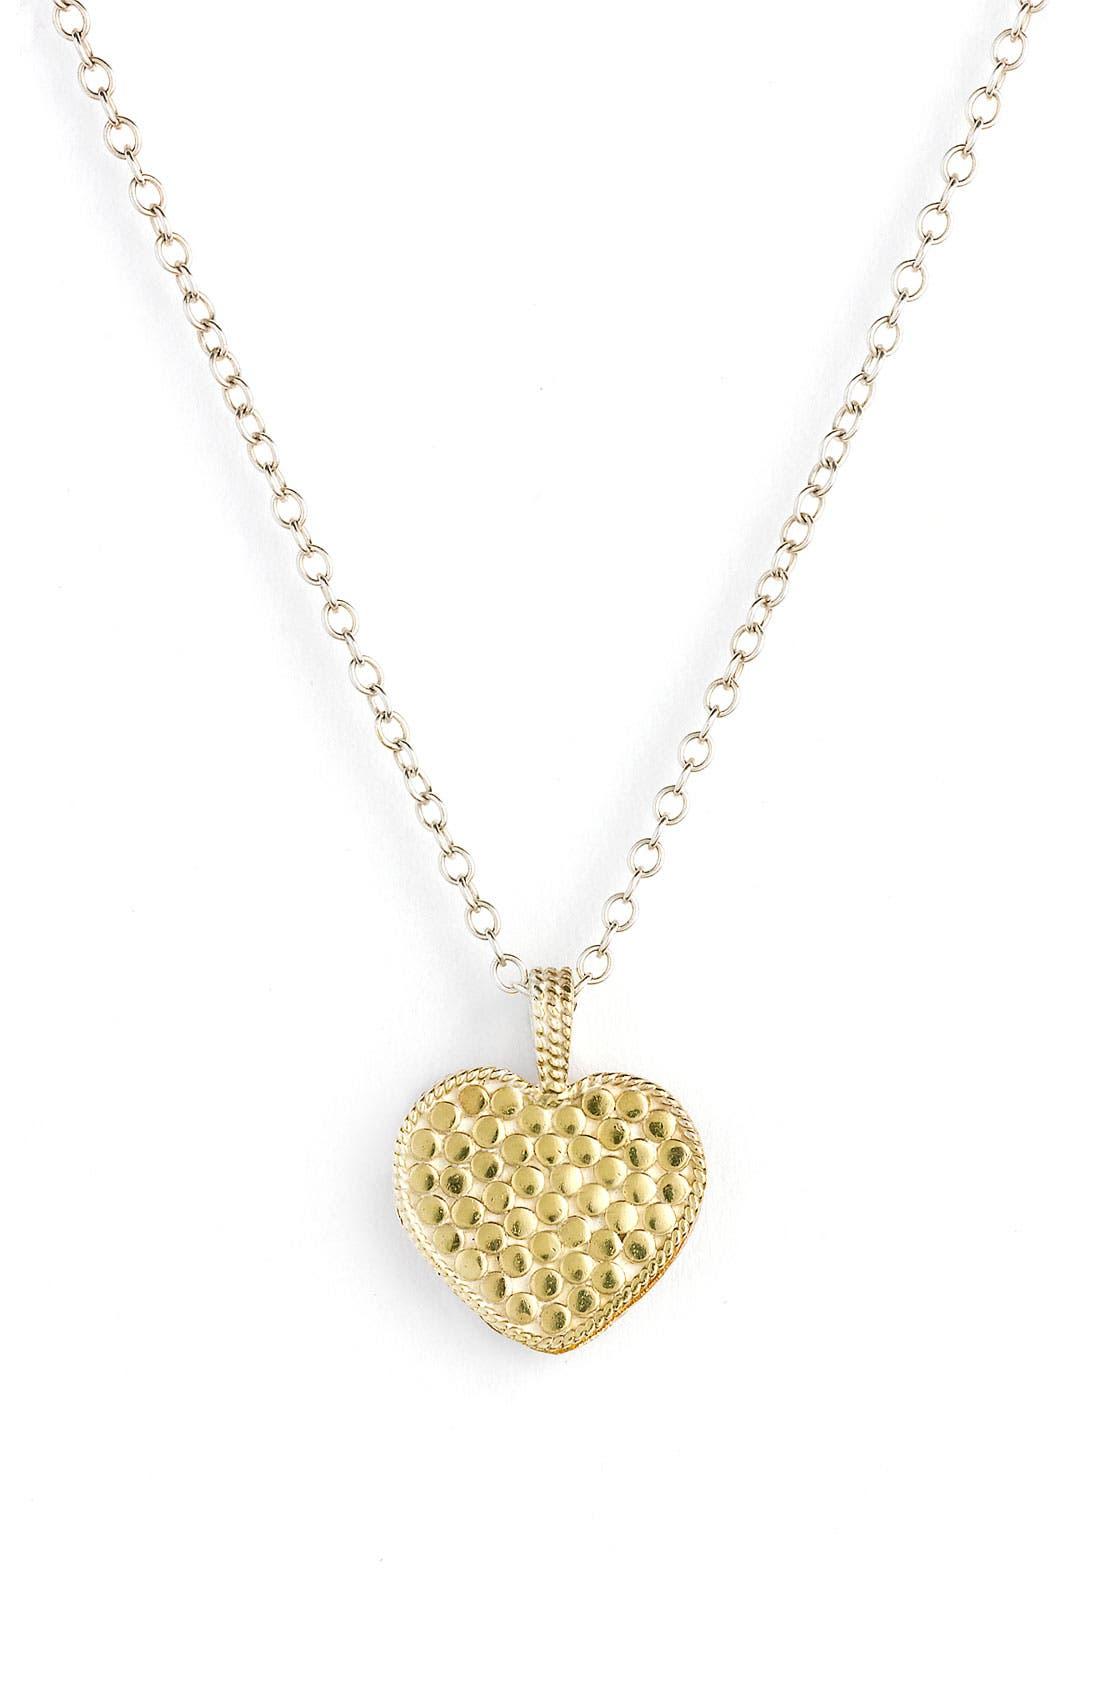 Main Image - Anna Beck 'Gili' Reversible Heart Pendant Necklace